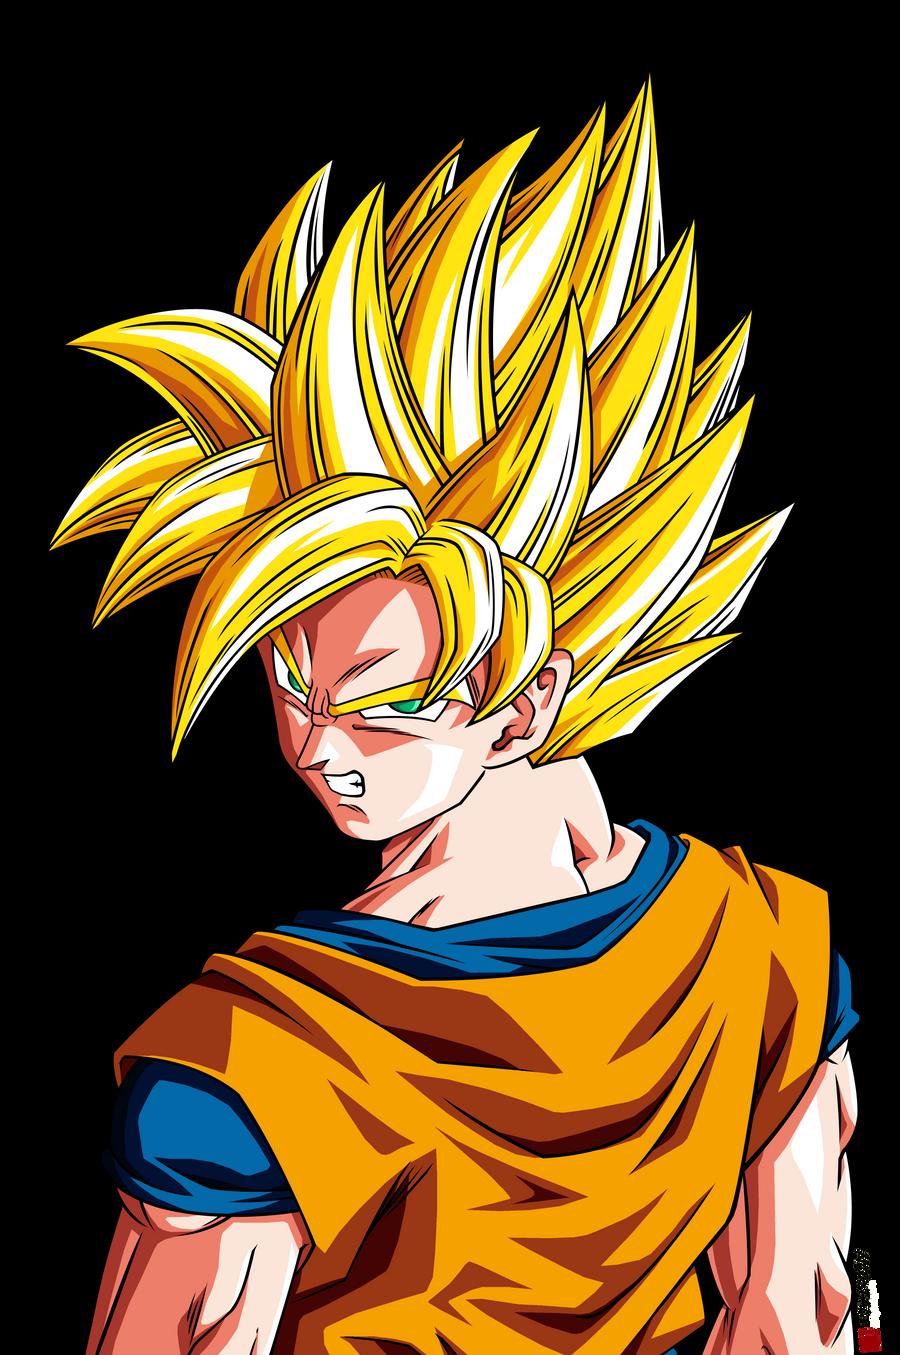 Son Goku ssj  Raging Blast HD by Nostal on DeviantArt